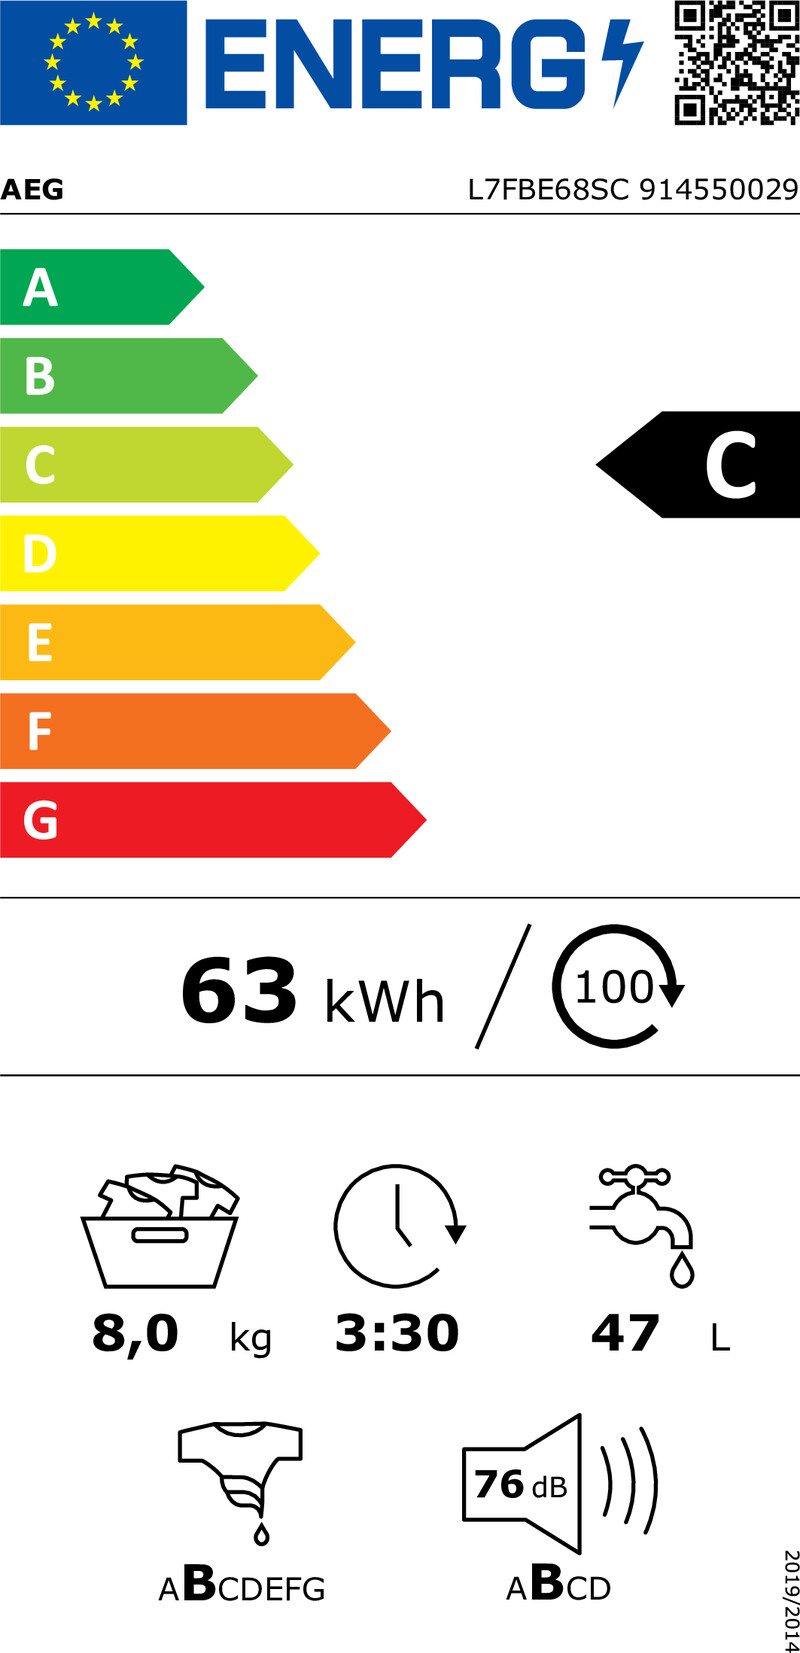 Energetický štítek AEG ProSteam® L7FBE68SC